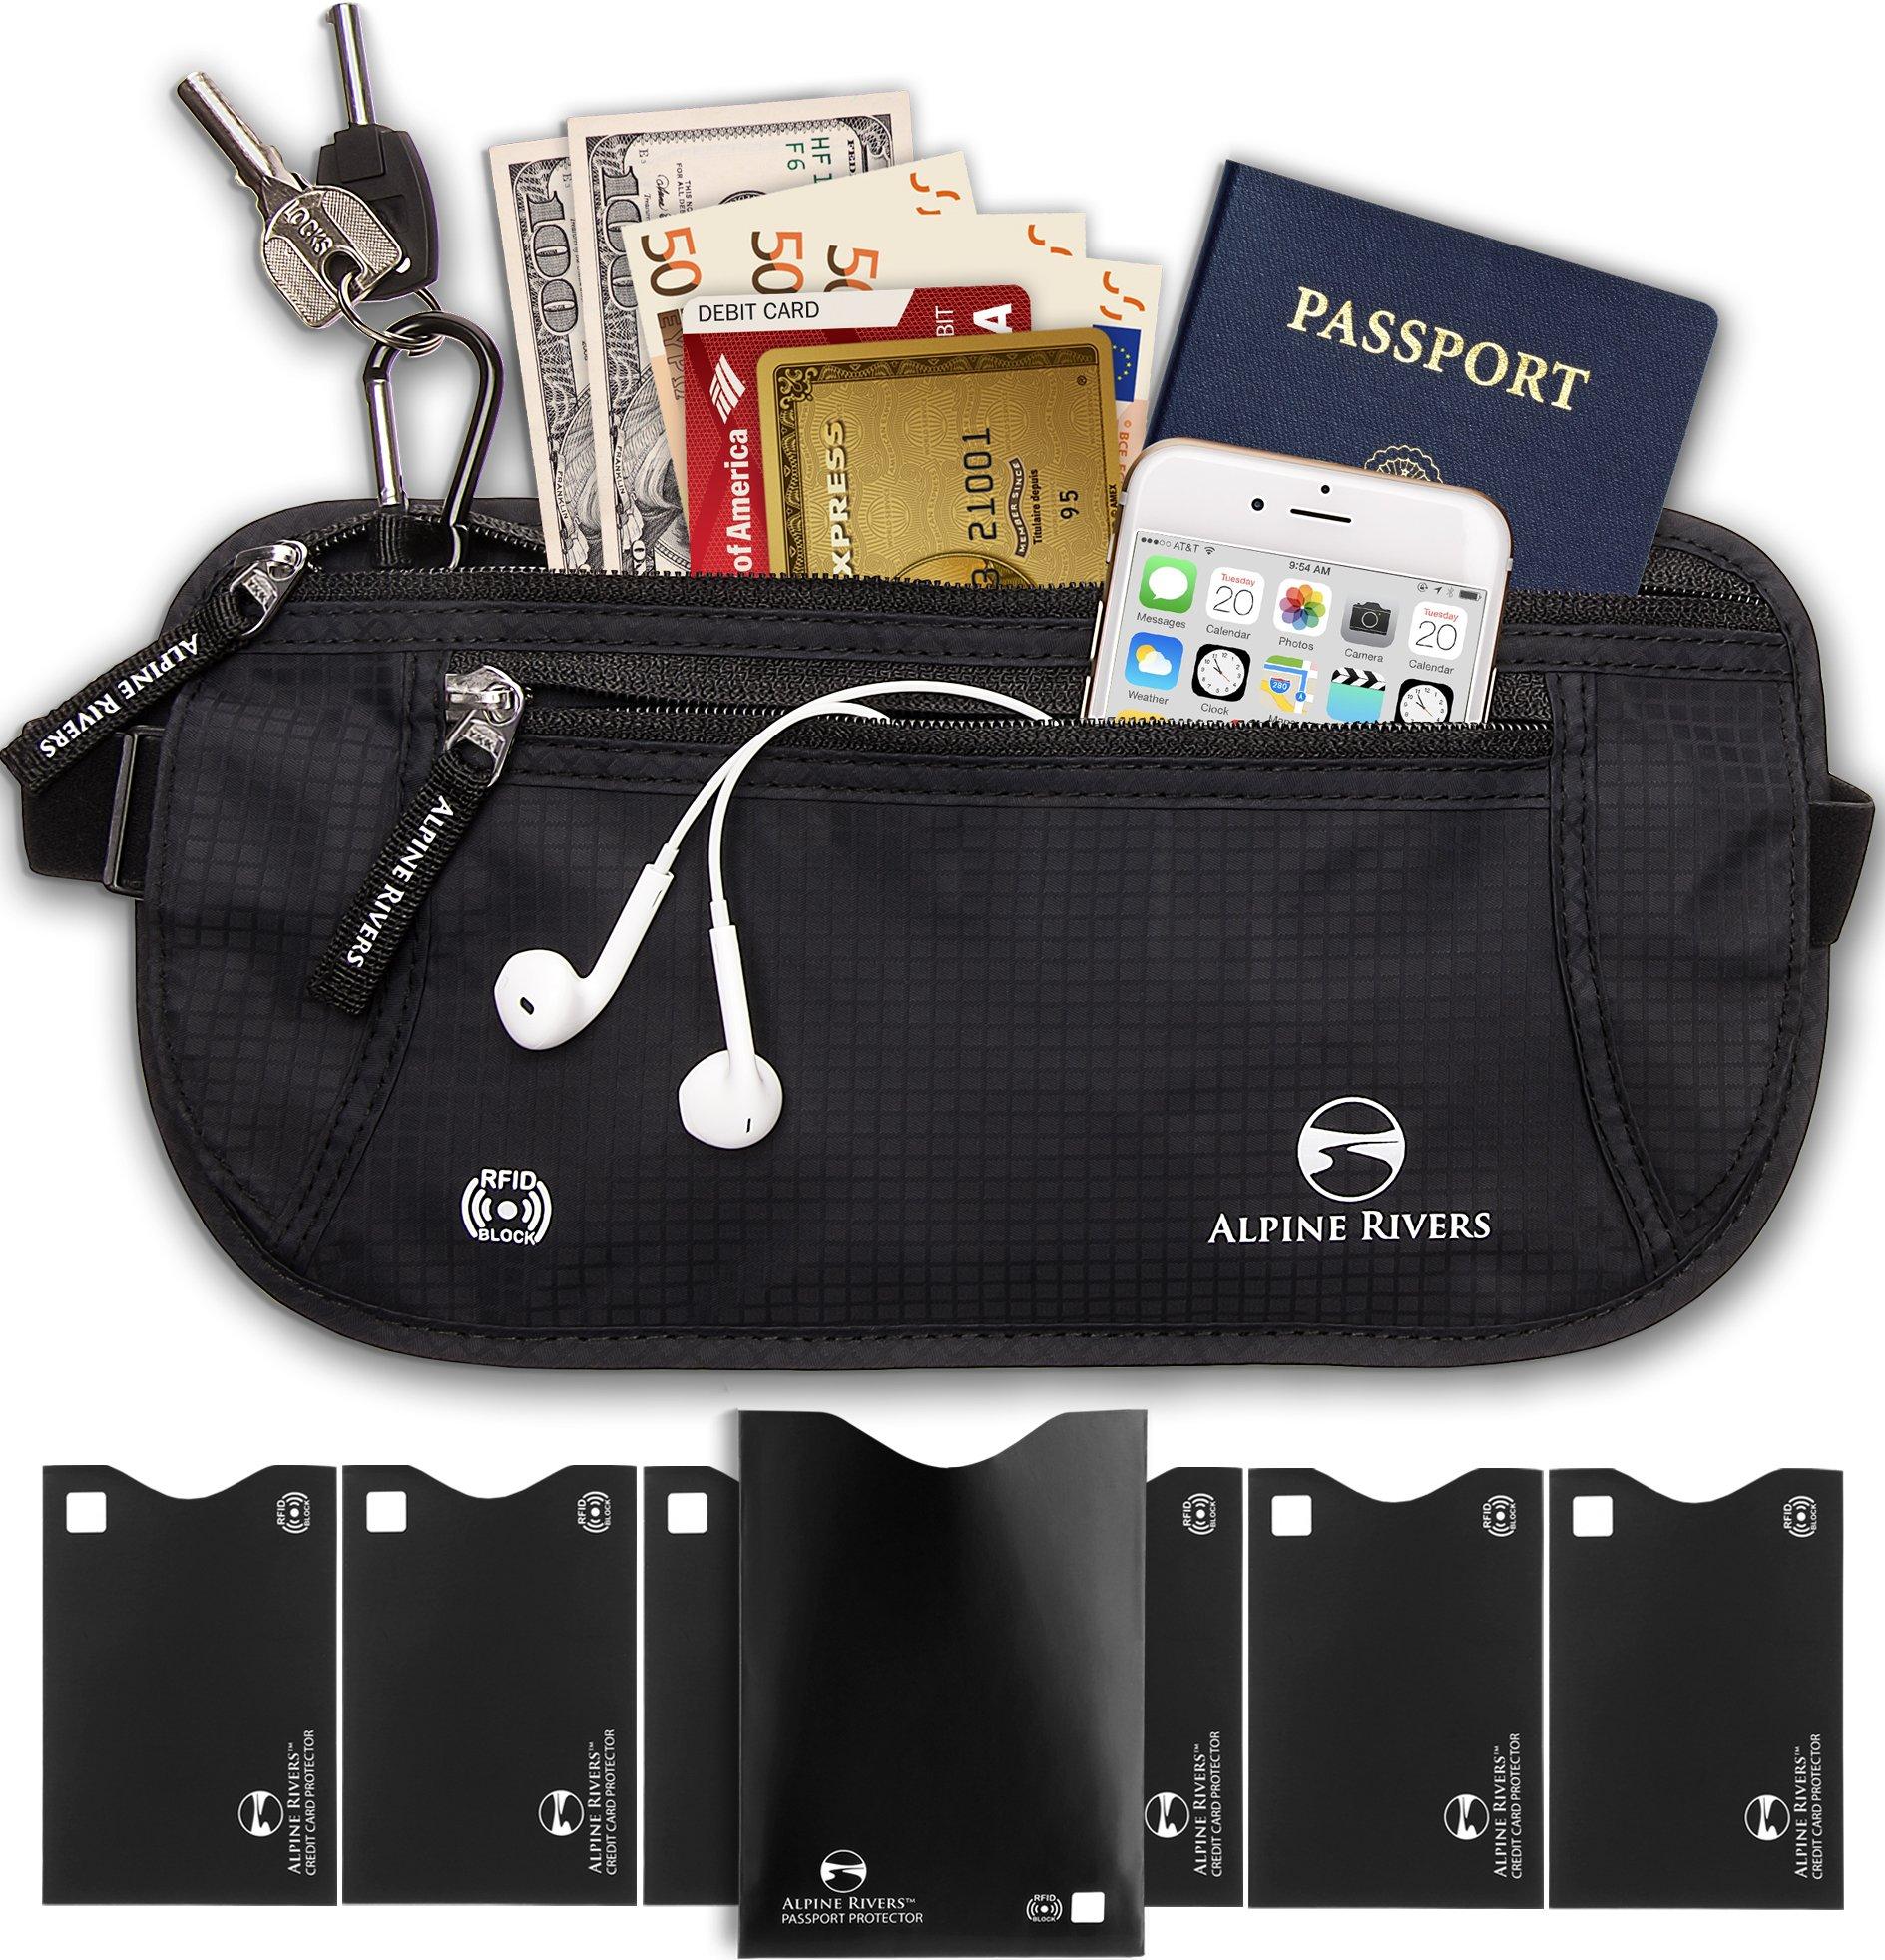 Money Belt - RFID Blocking Hidden Travel Wallet with 7 Bonus Sleeves by Alpine Rivers